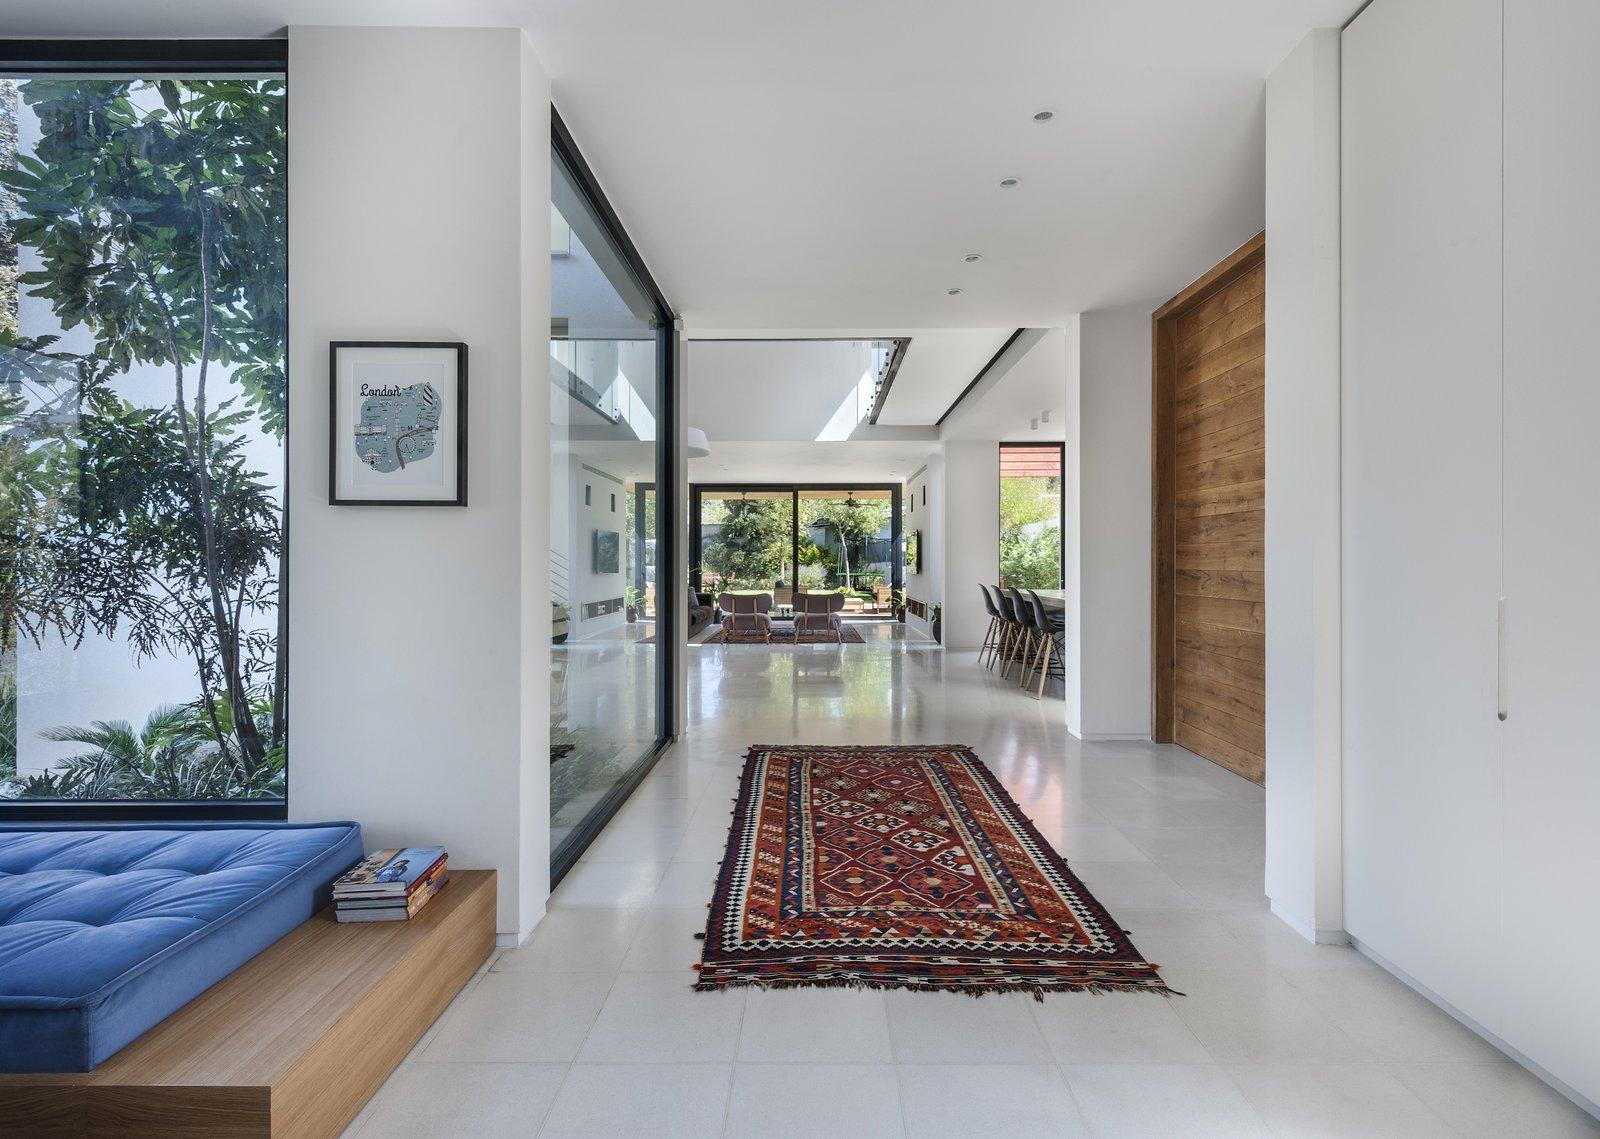 Doors, Wood, Interior, and Folding Door Type Ravit Dvir Architecture and Design  The House in Harutzim